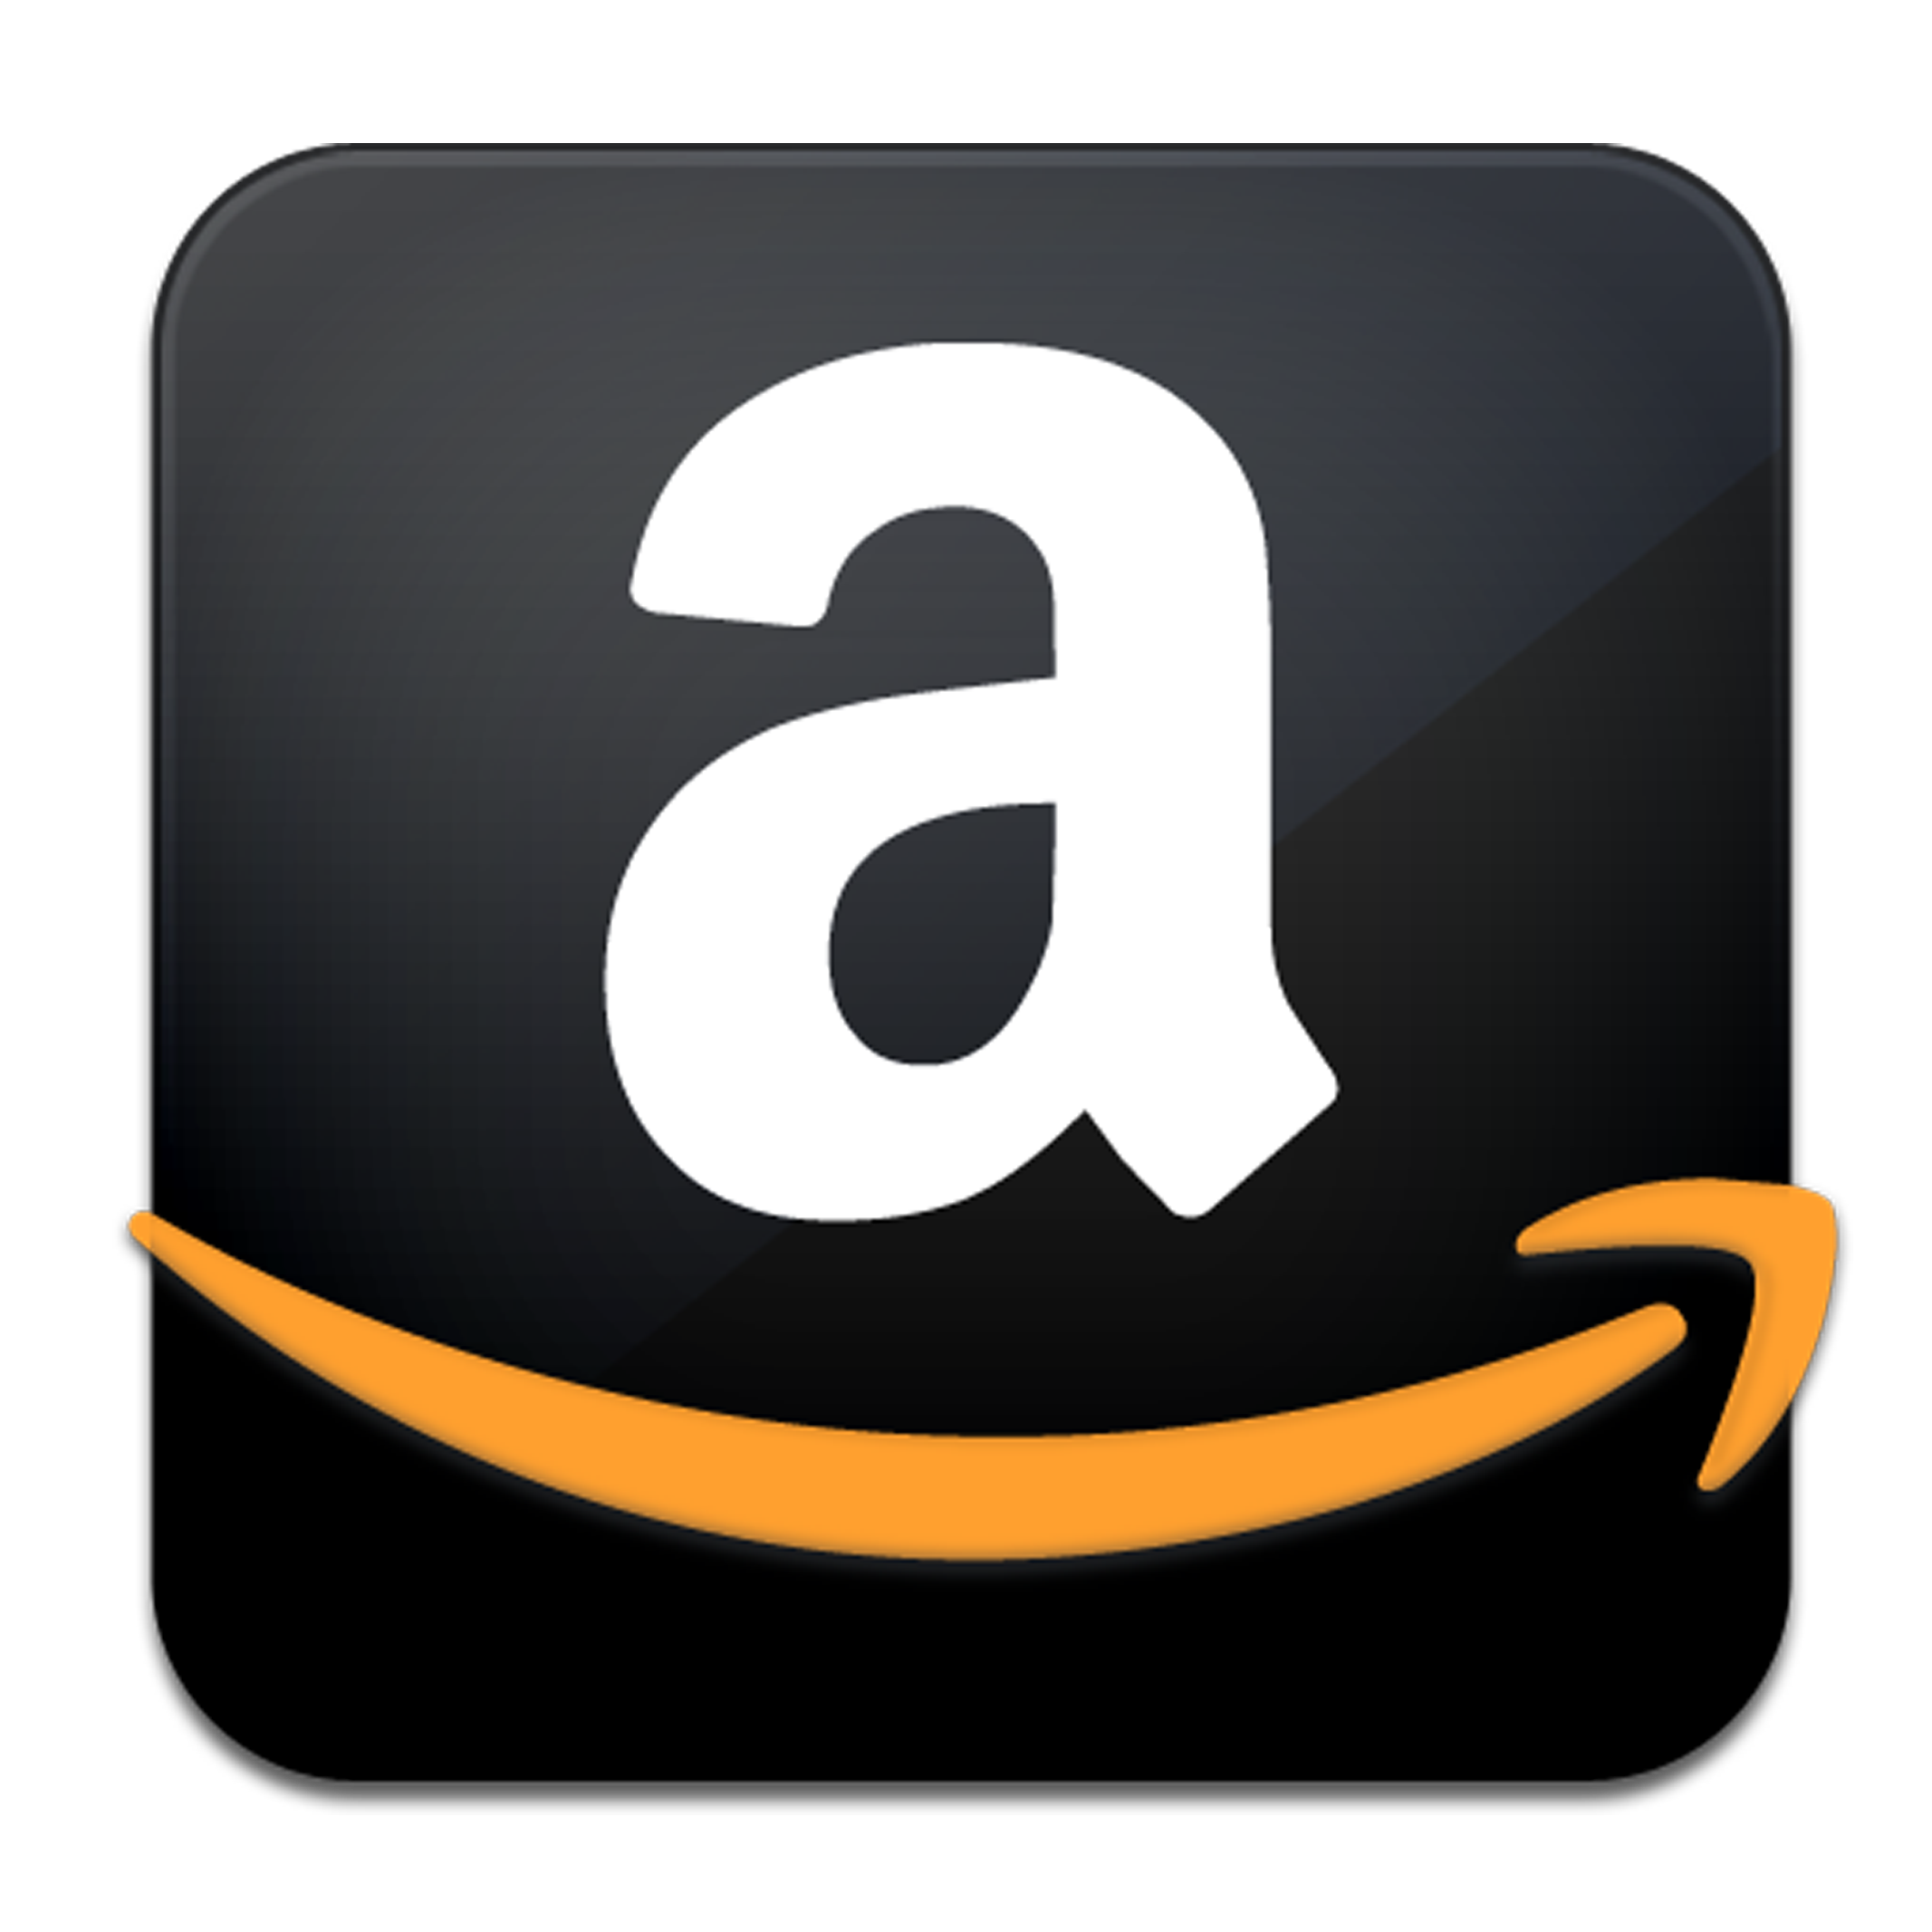 Amazon kindle clipart.